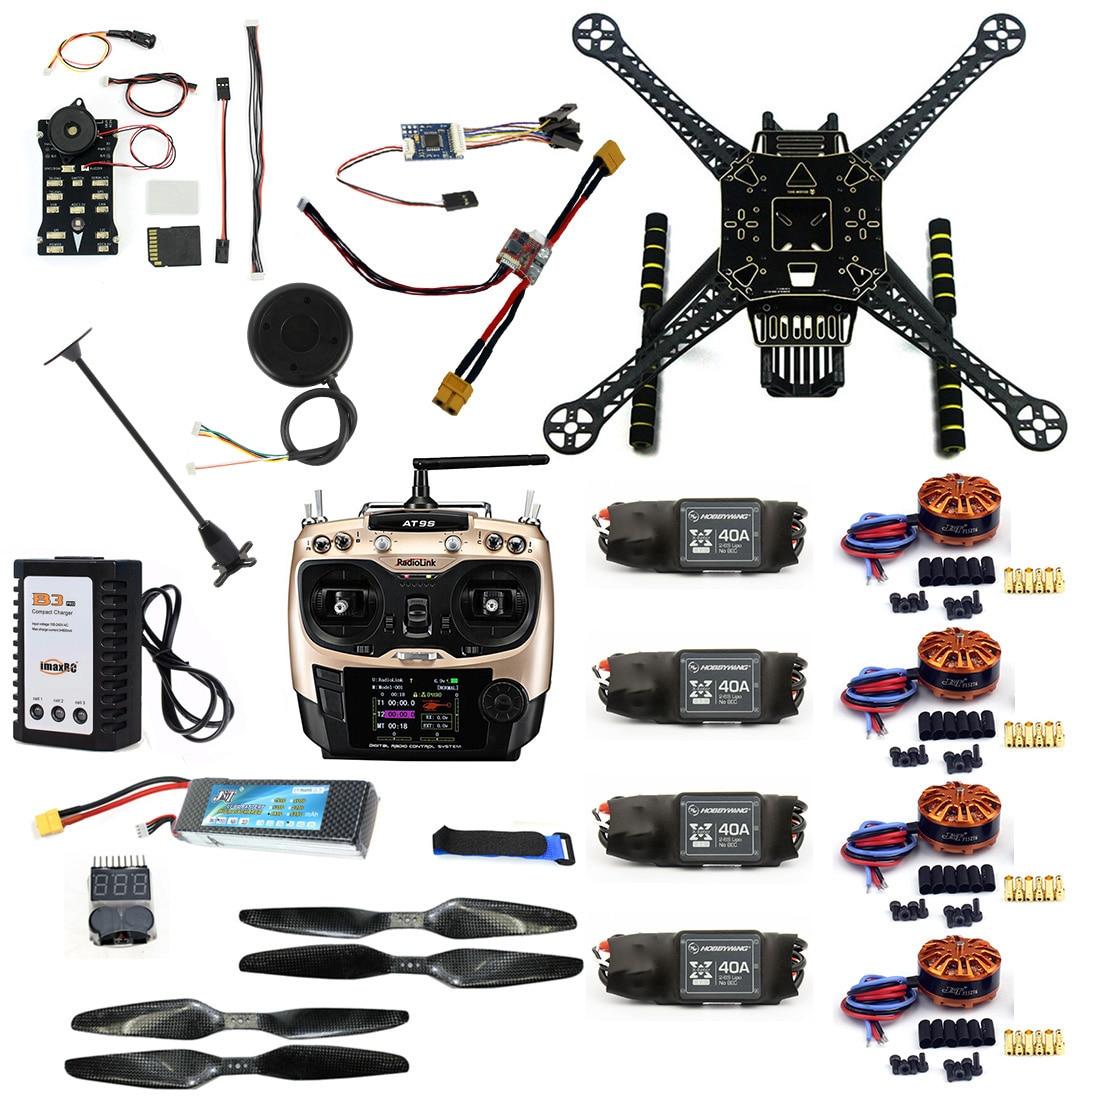 Genossenschaft F19457-c Diy Rc Drone Full Kit S600 Rahmen Pix 2.4.8 Flight Control 40a Esc 700kv Motor At9s Tx Mit Batterie Ladegerät Xt60 Stecker Duftendes In Aroma